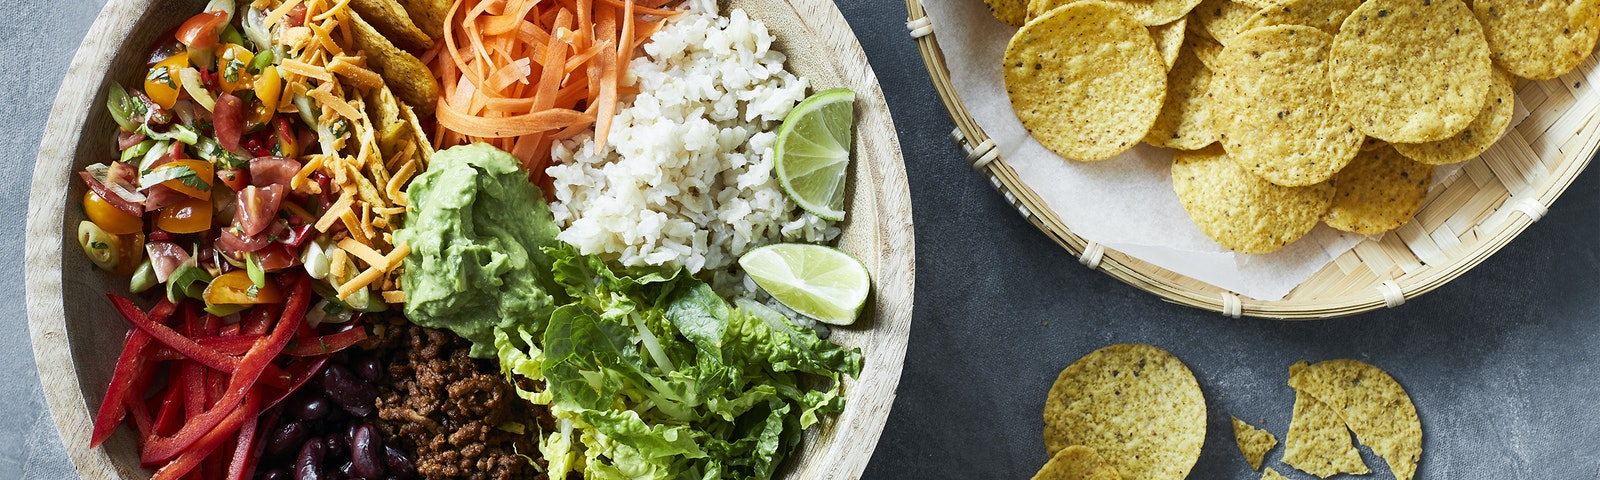 Mexicansk burrito bowl med ris